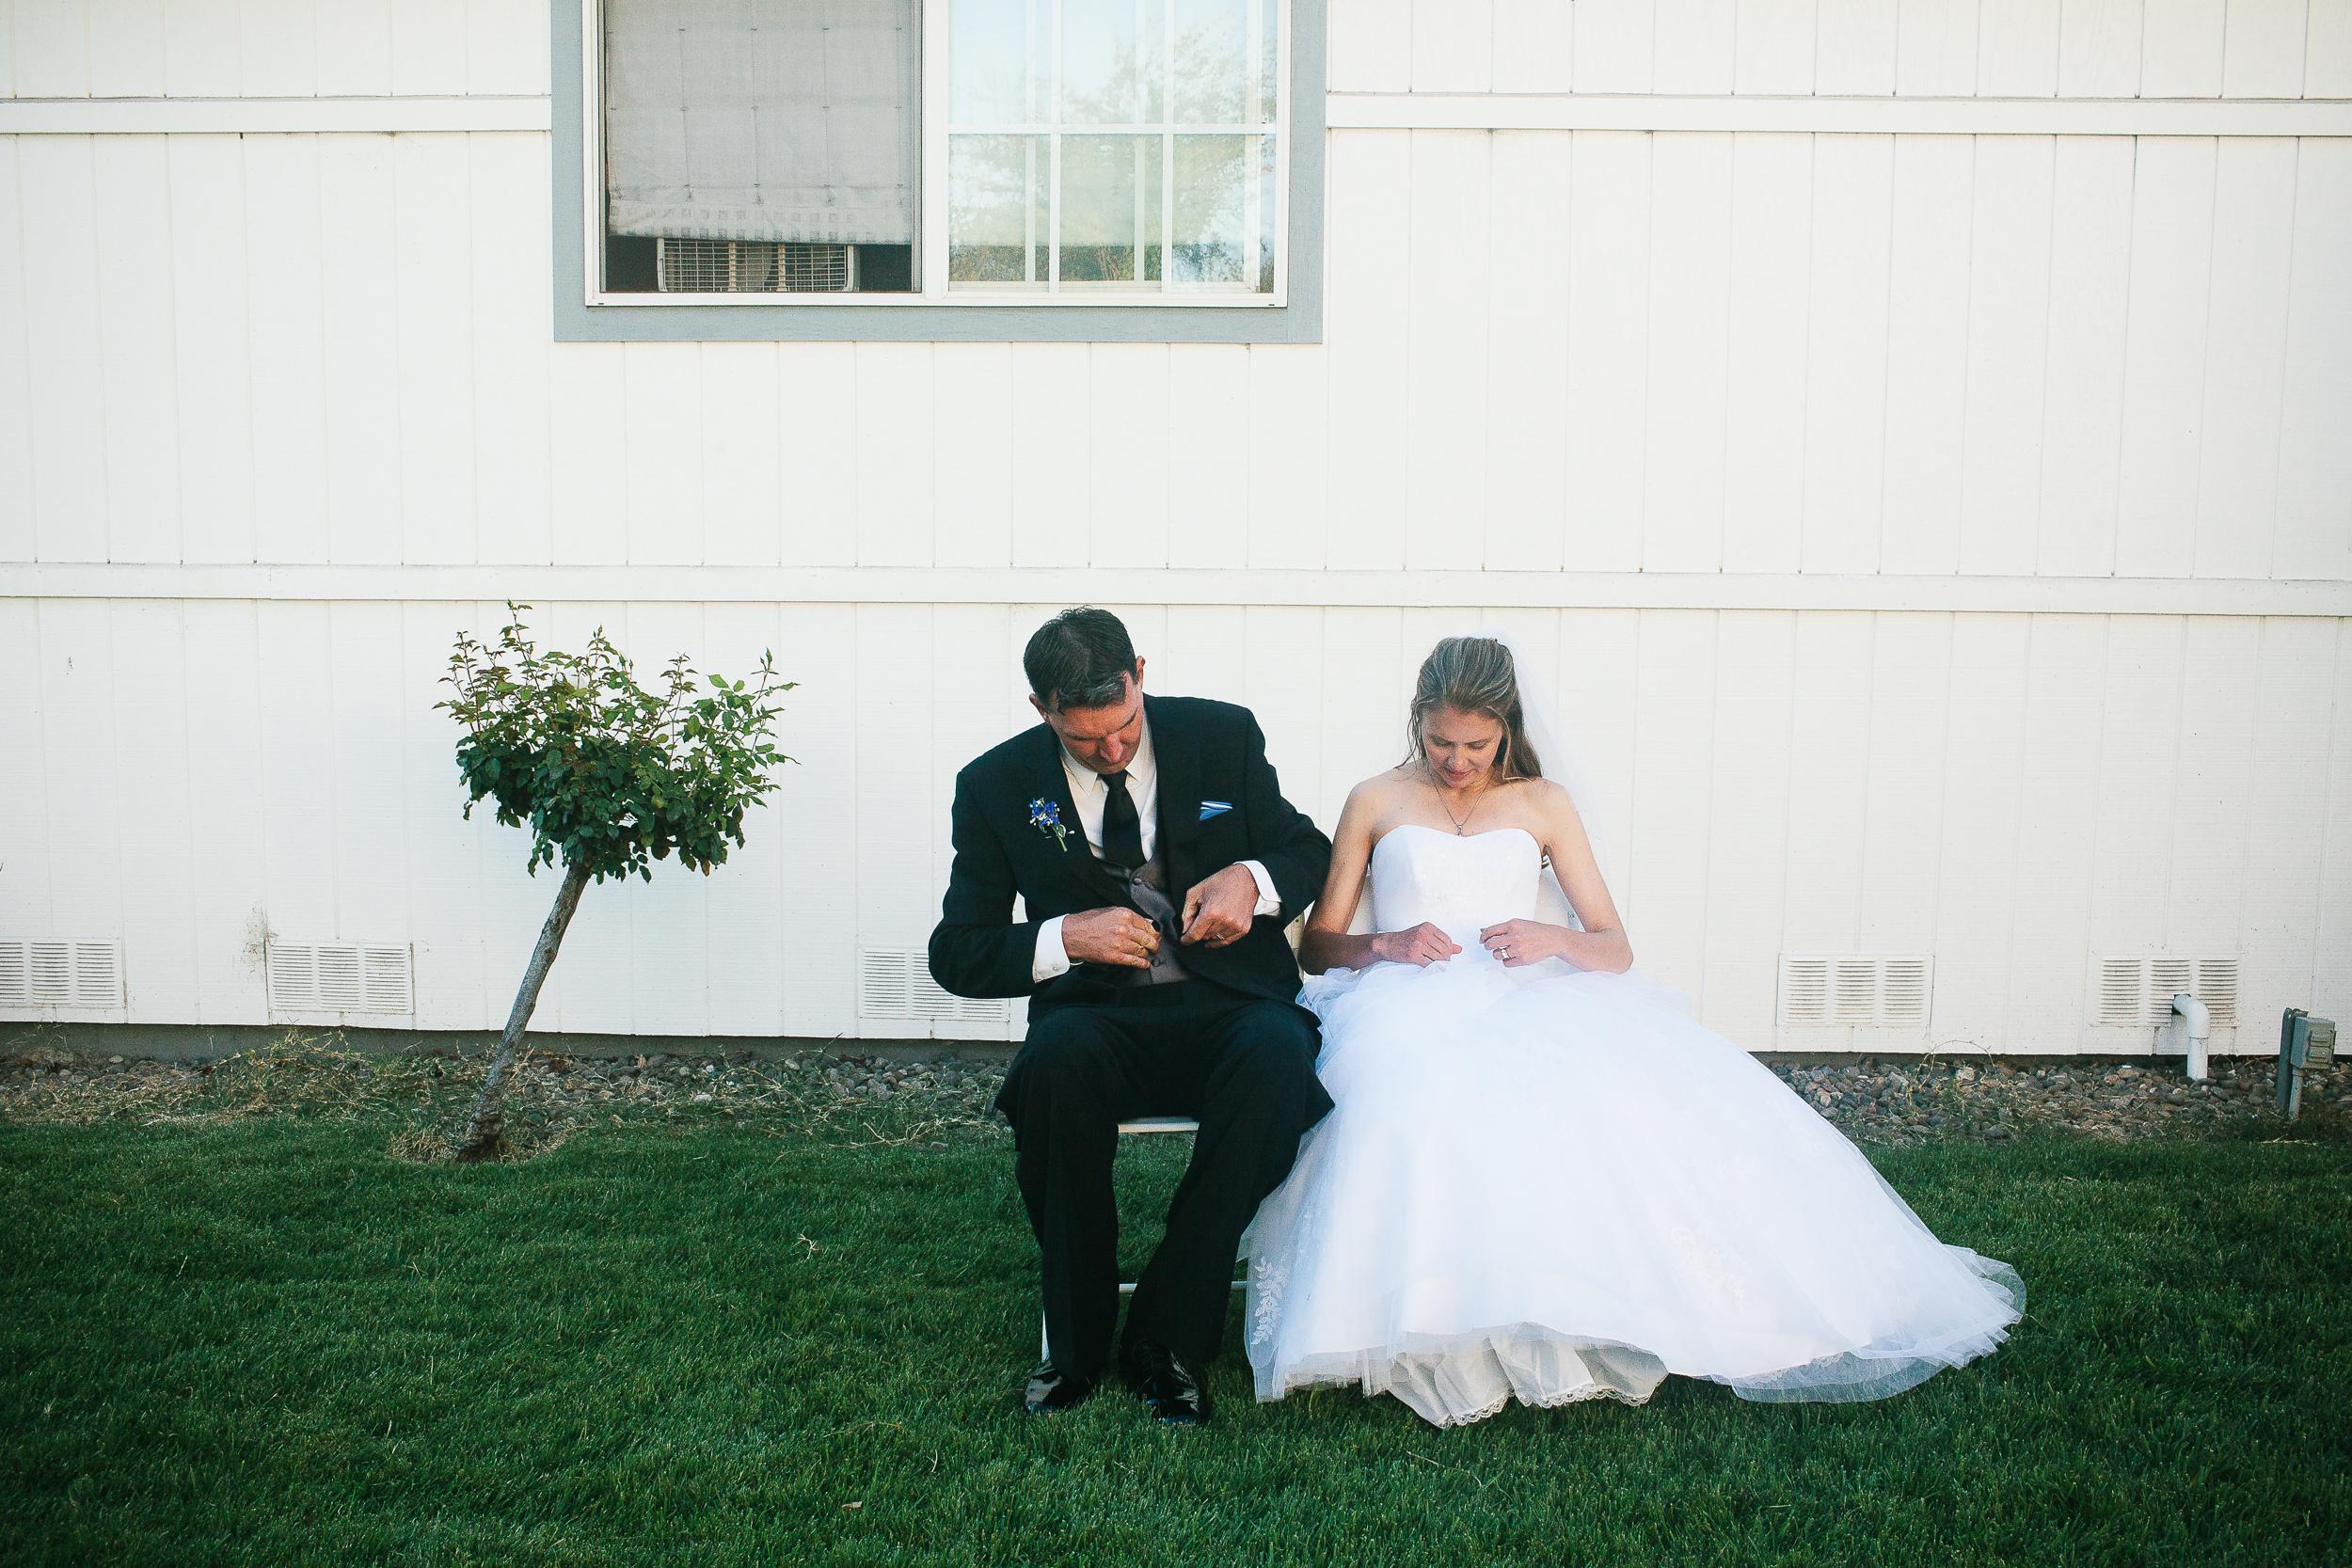 Anna_Wedding_SharonMcKeeman-108.jpg